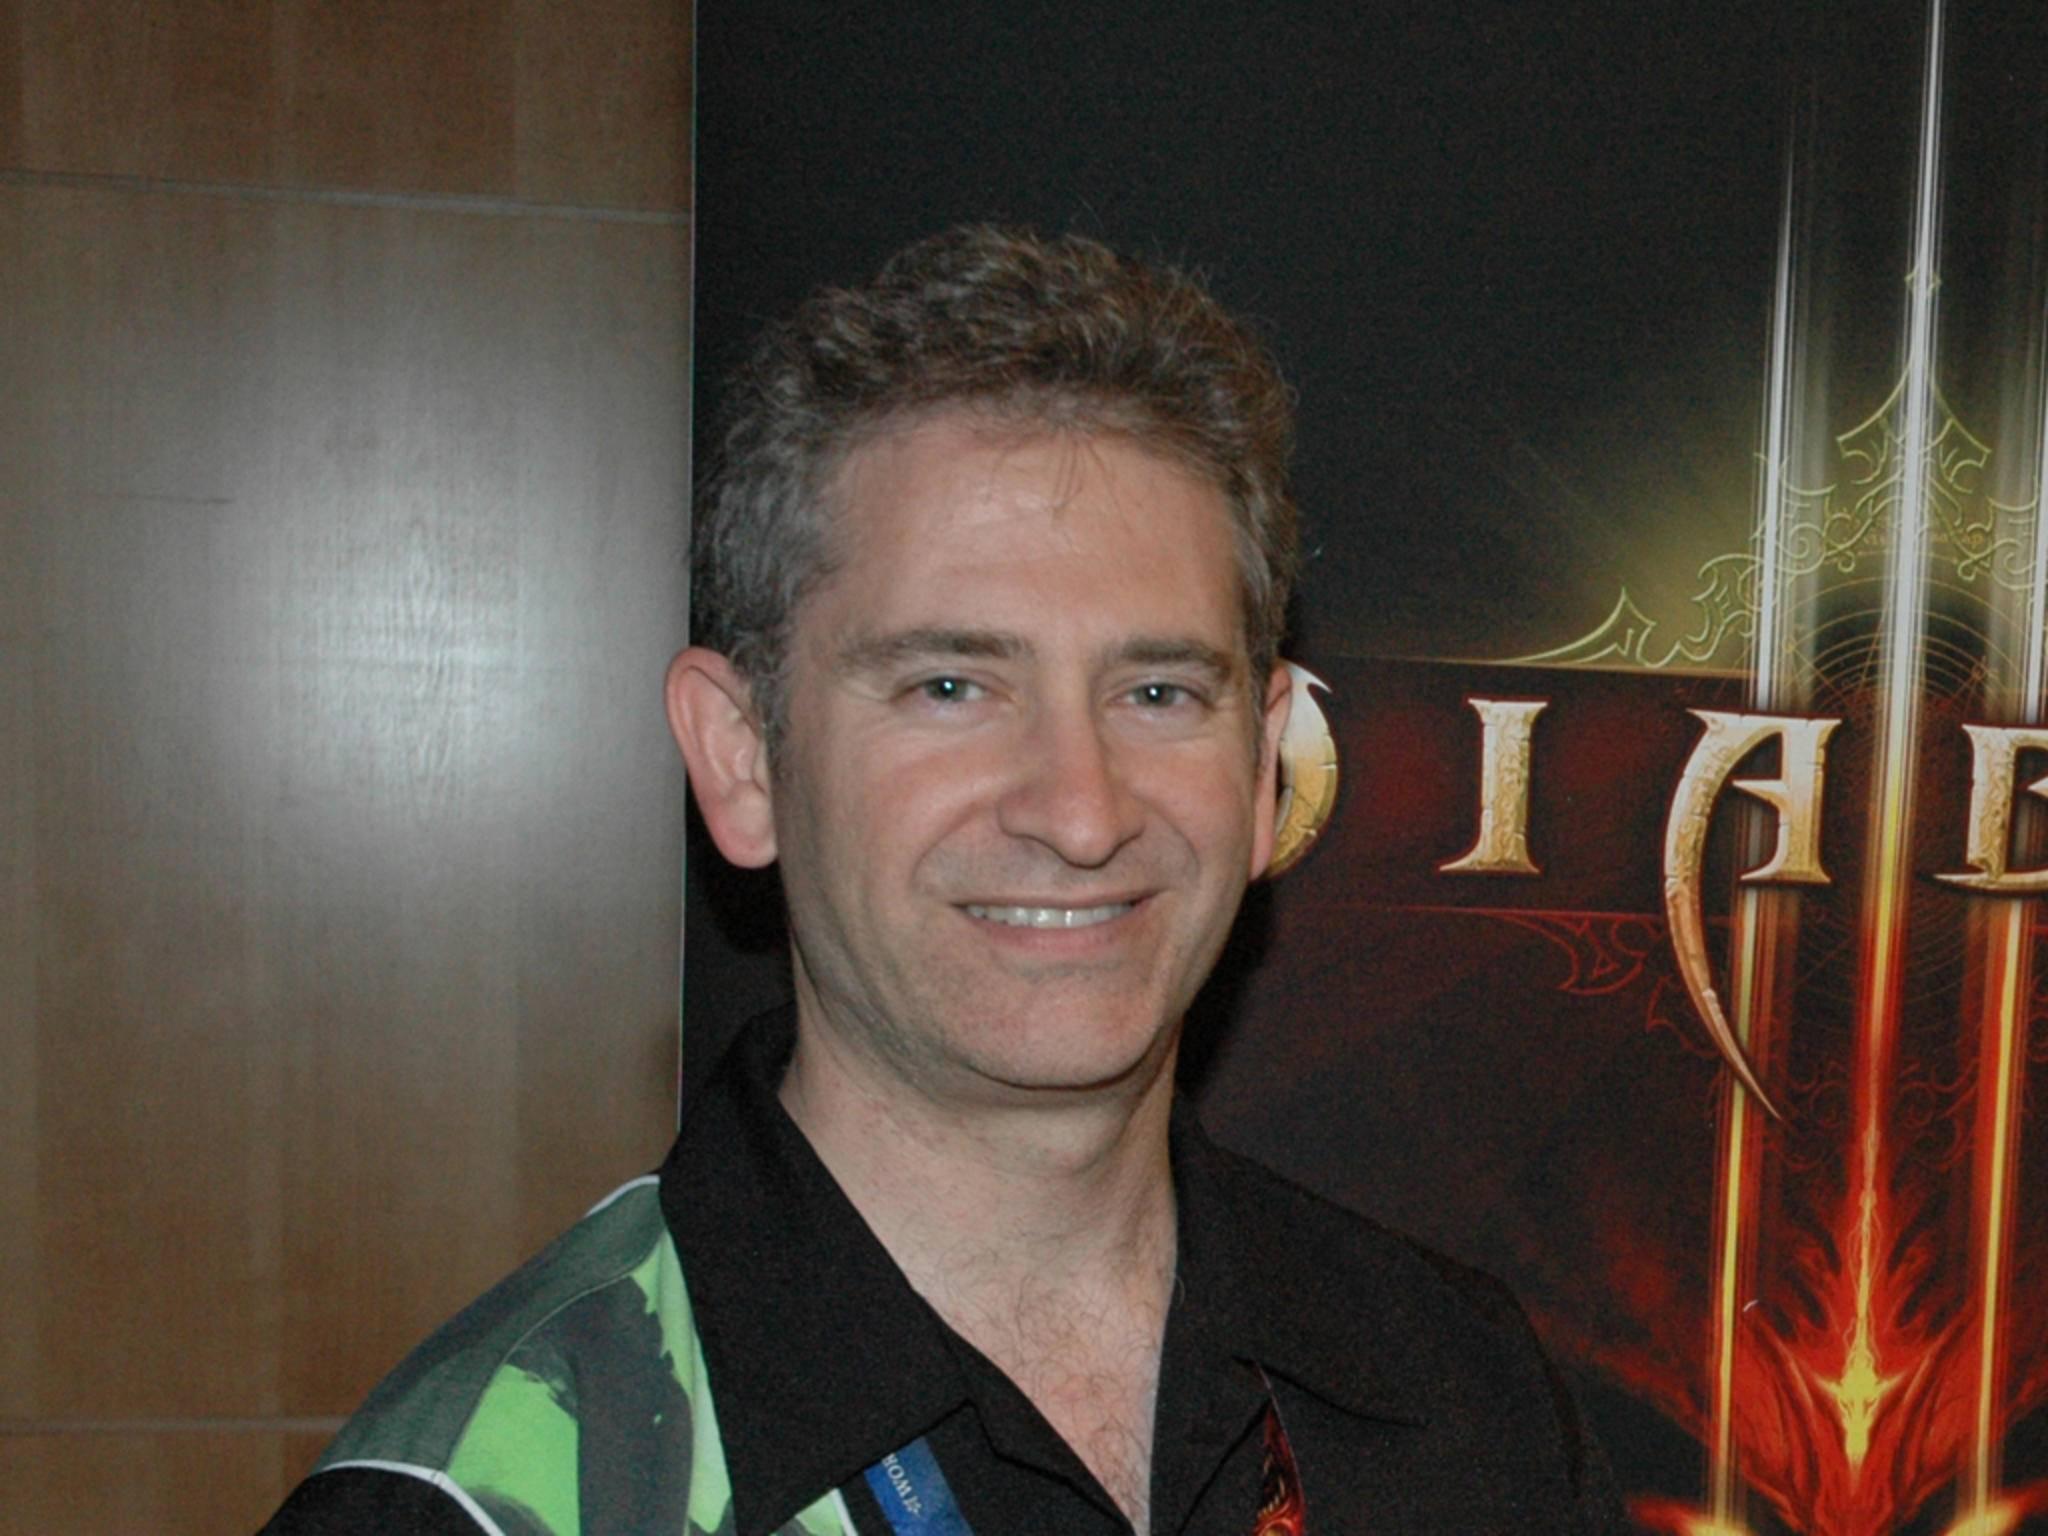 Blizzard-Boss Mike Morhaime.